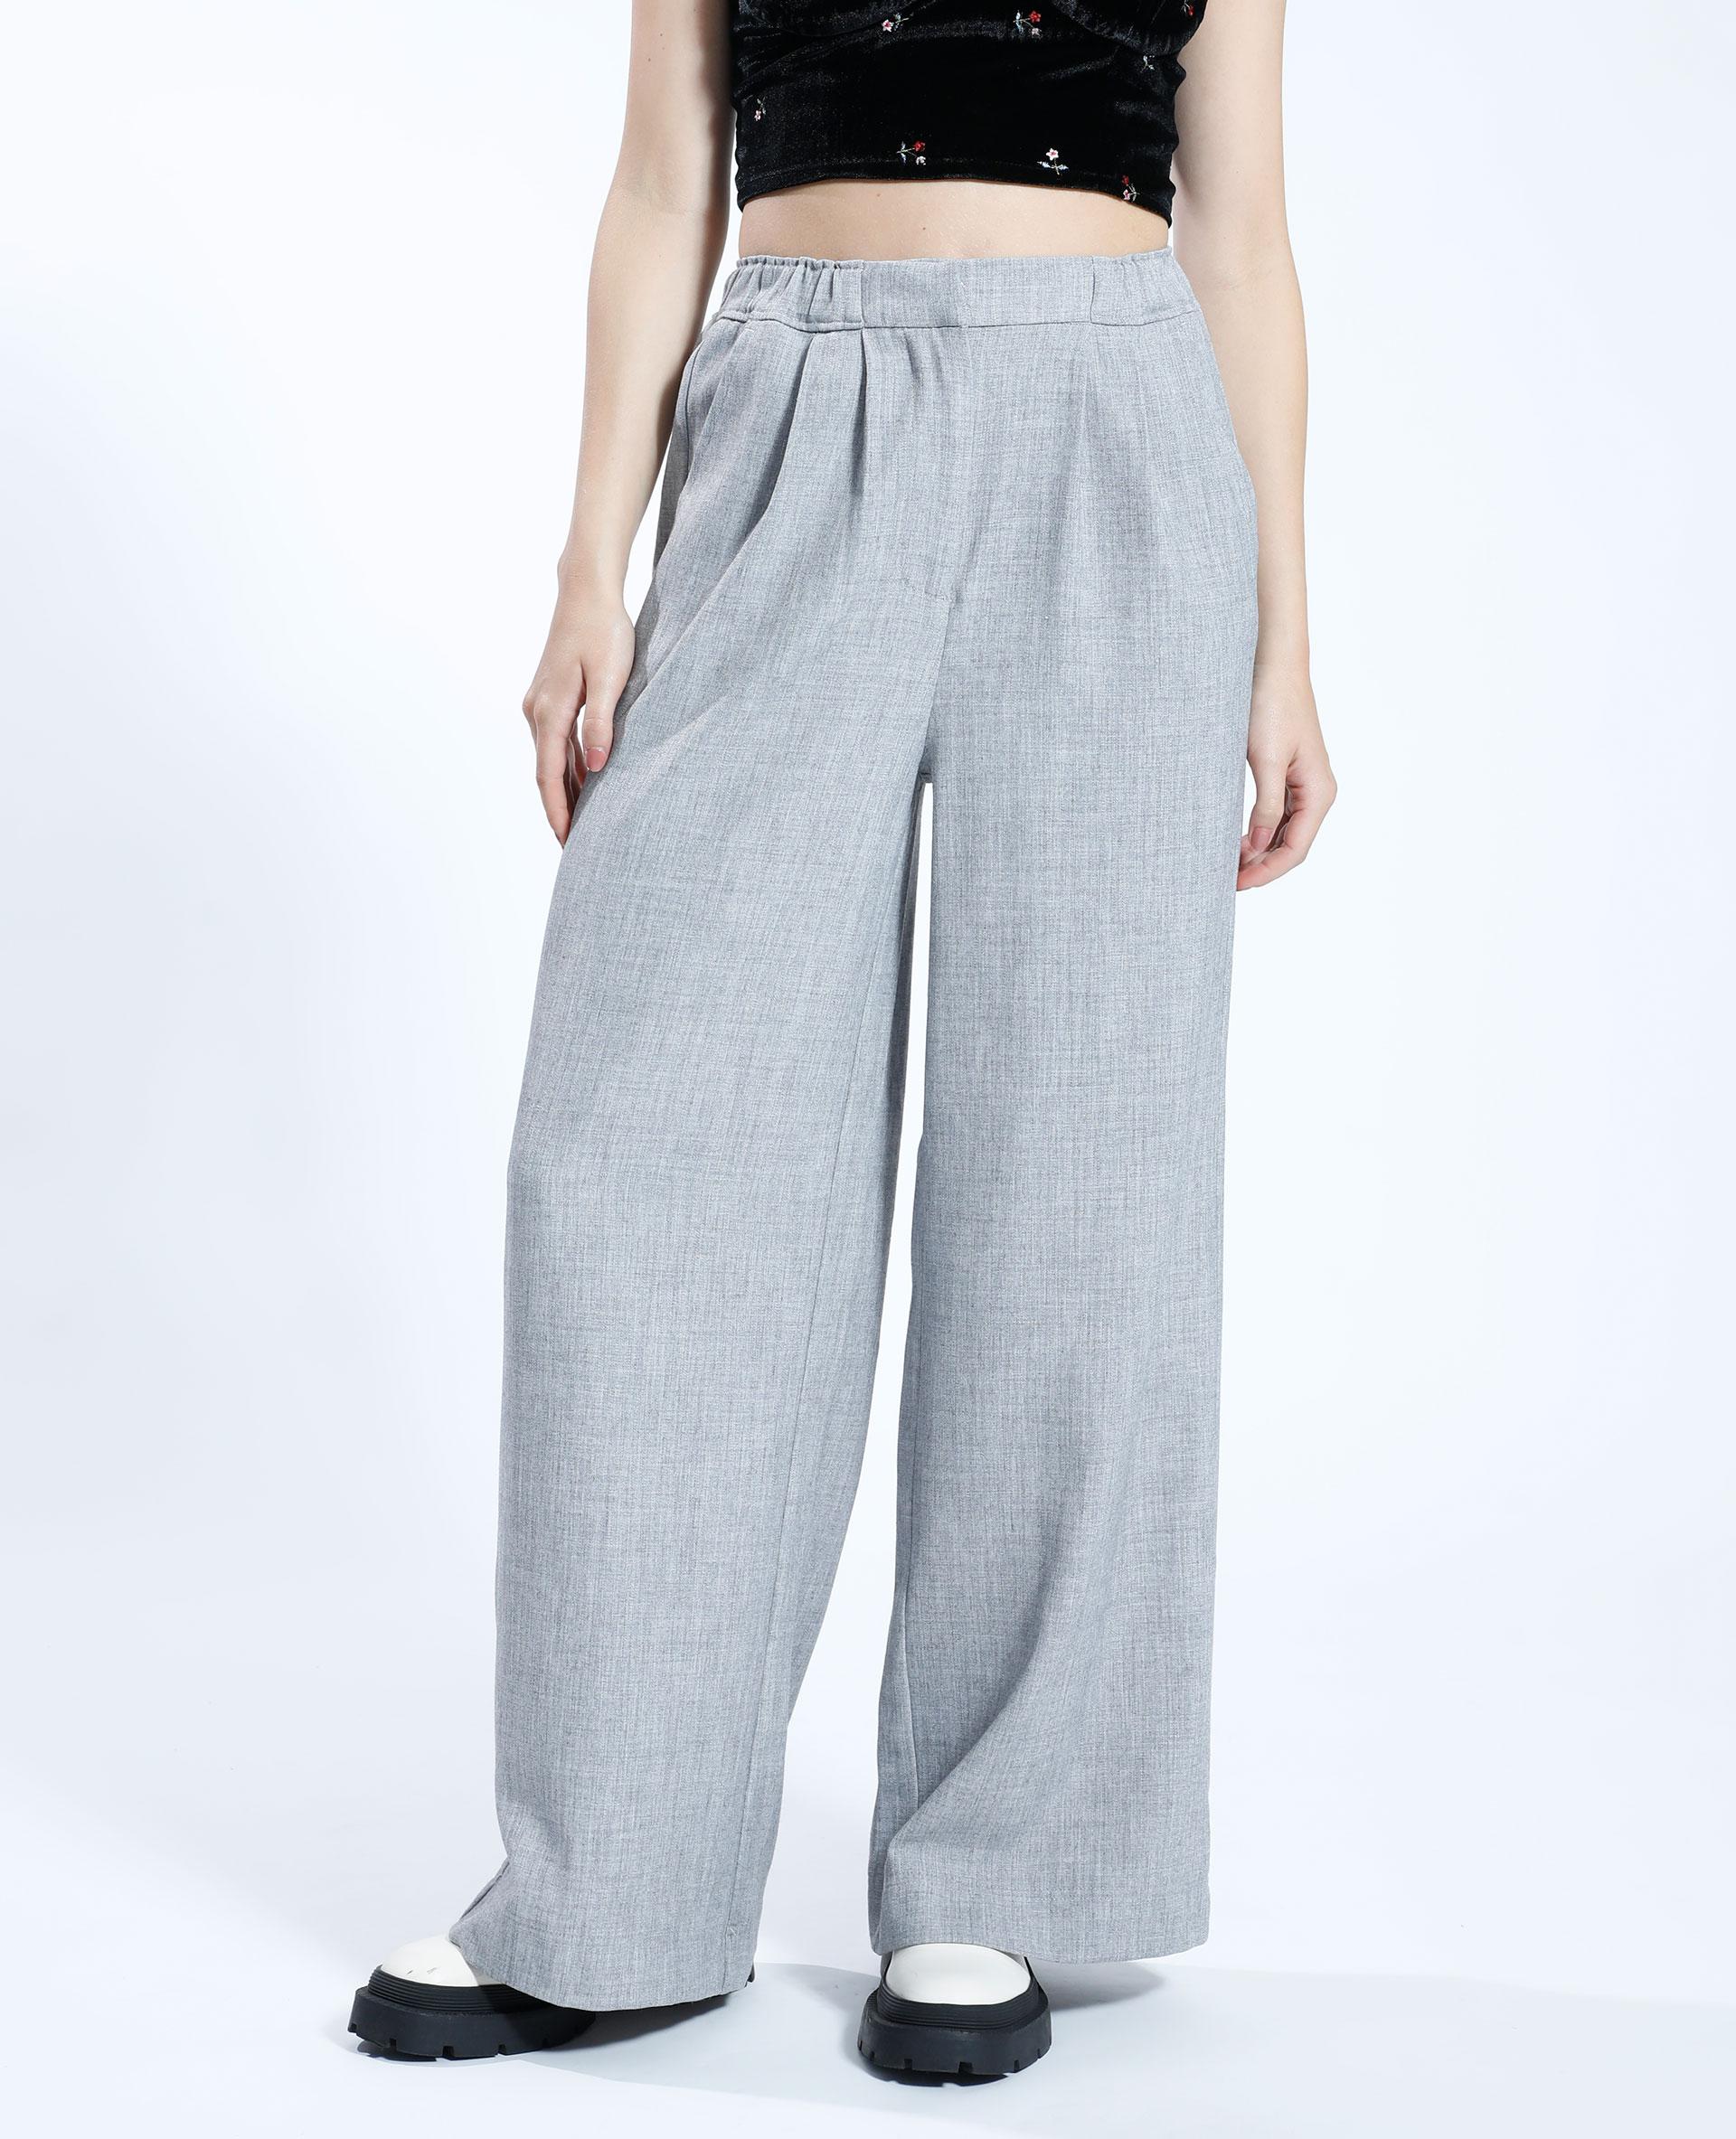 Pantalon wide leg gris chiné - Pimkie